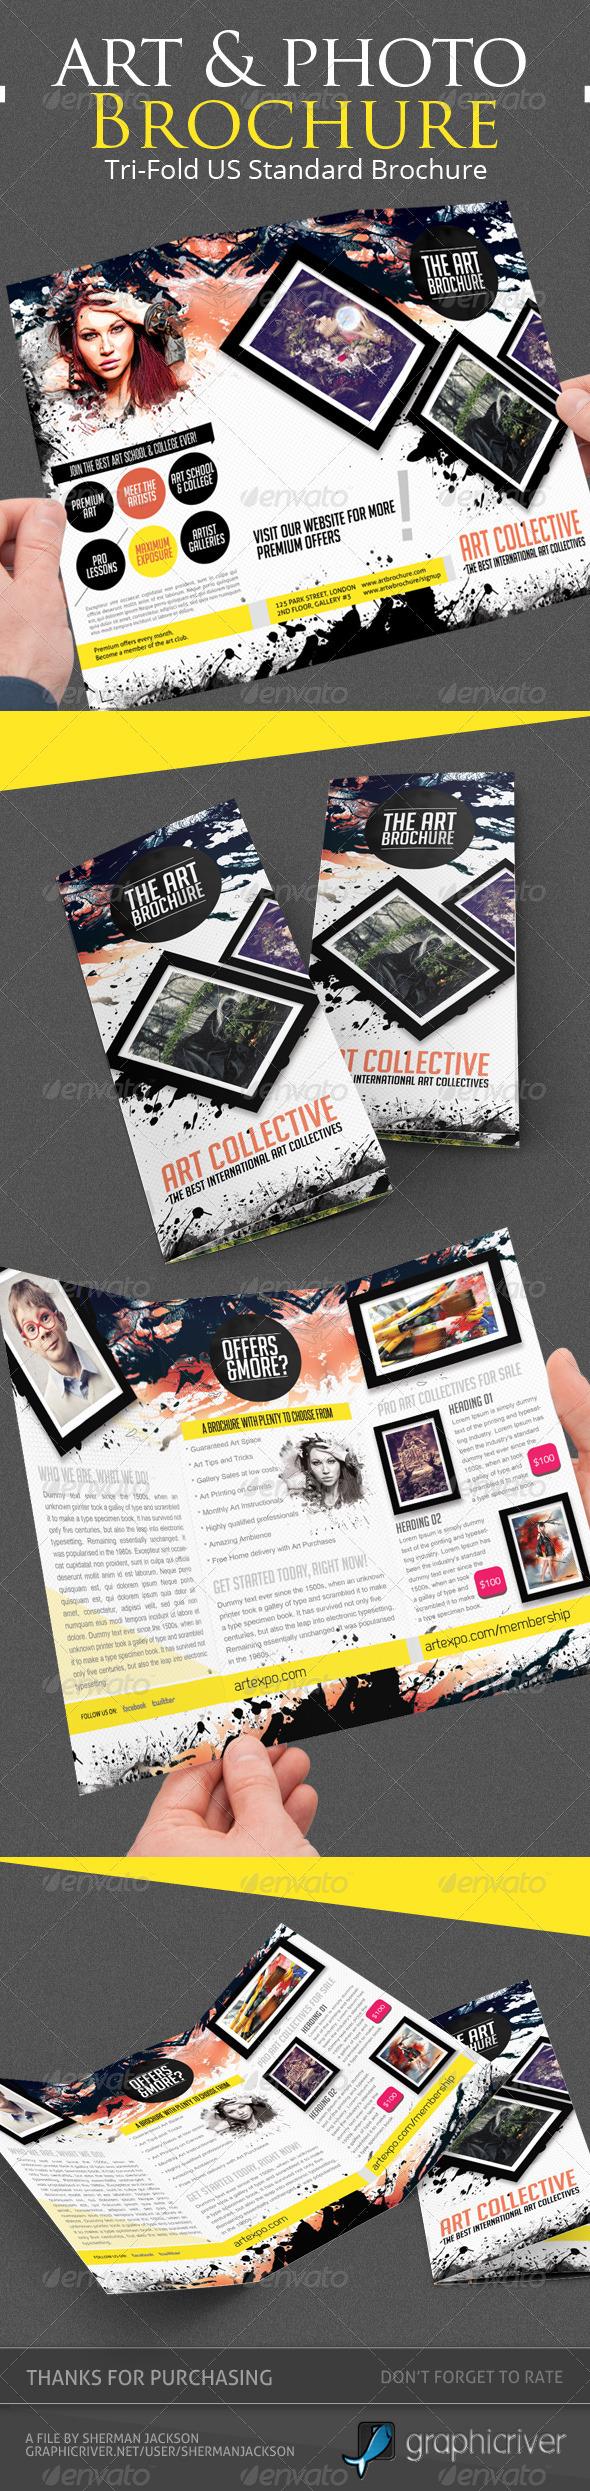 Art & Photo Tri-fold Brochure Template - Corporate Brochures